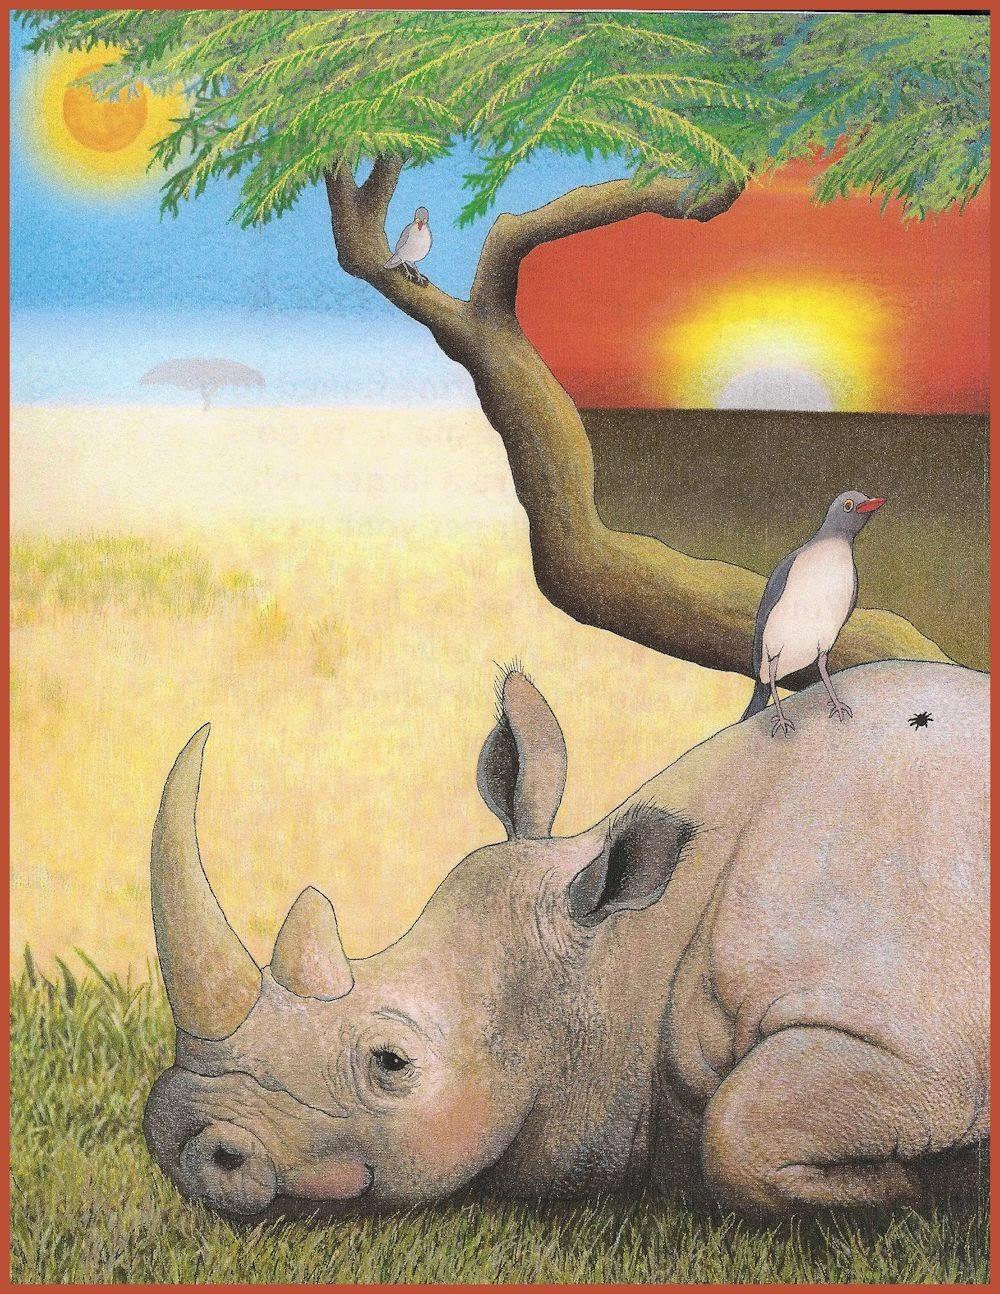 tick bird and rhinoceros relationship with god